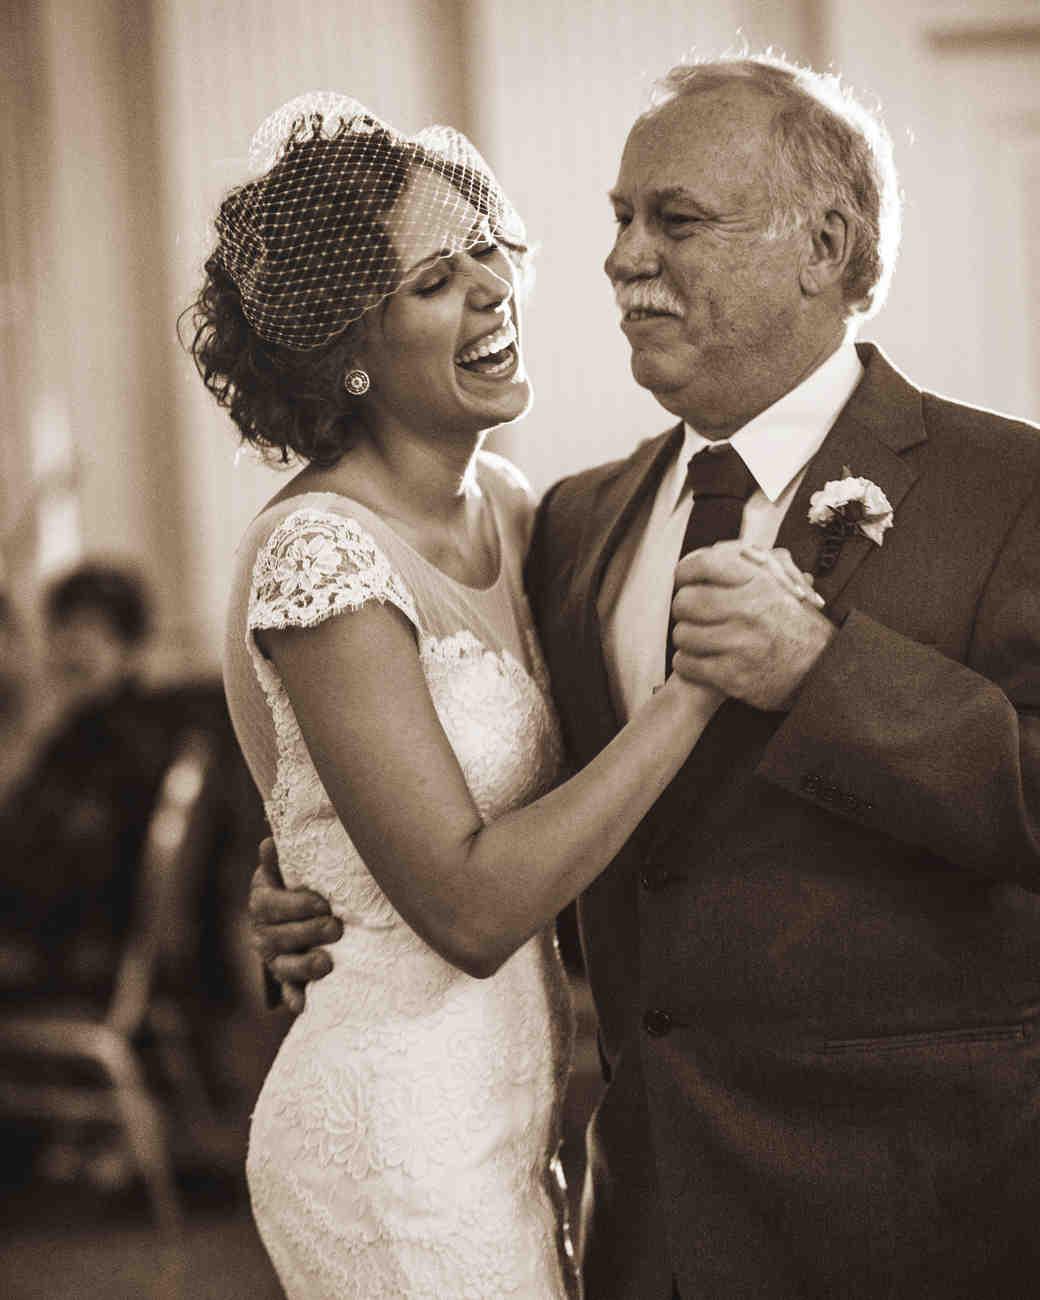 alix-bill-wedding-211-d3s-0800-2014-32-d111617-bw.jpg